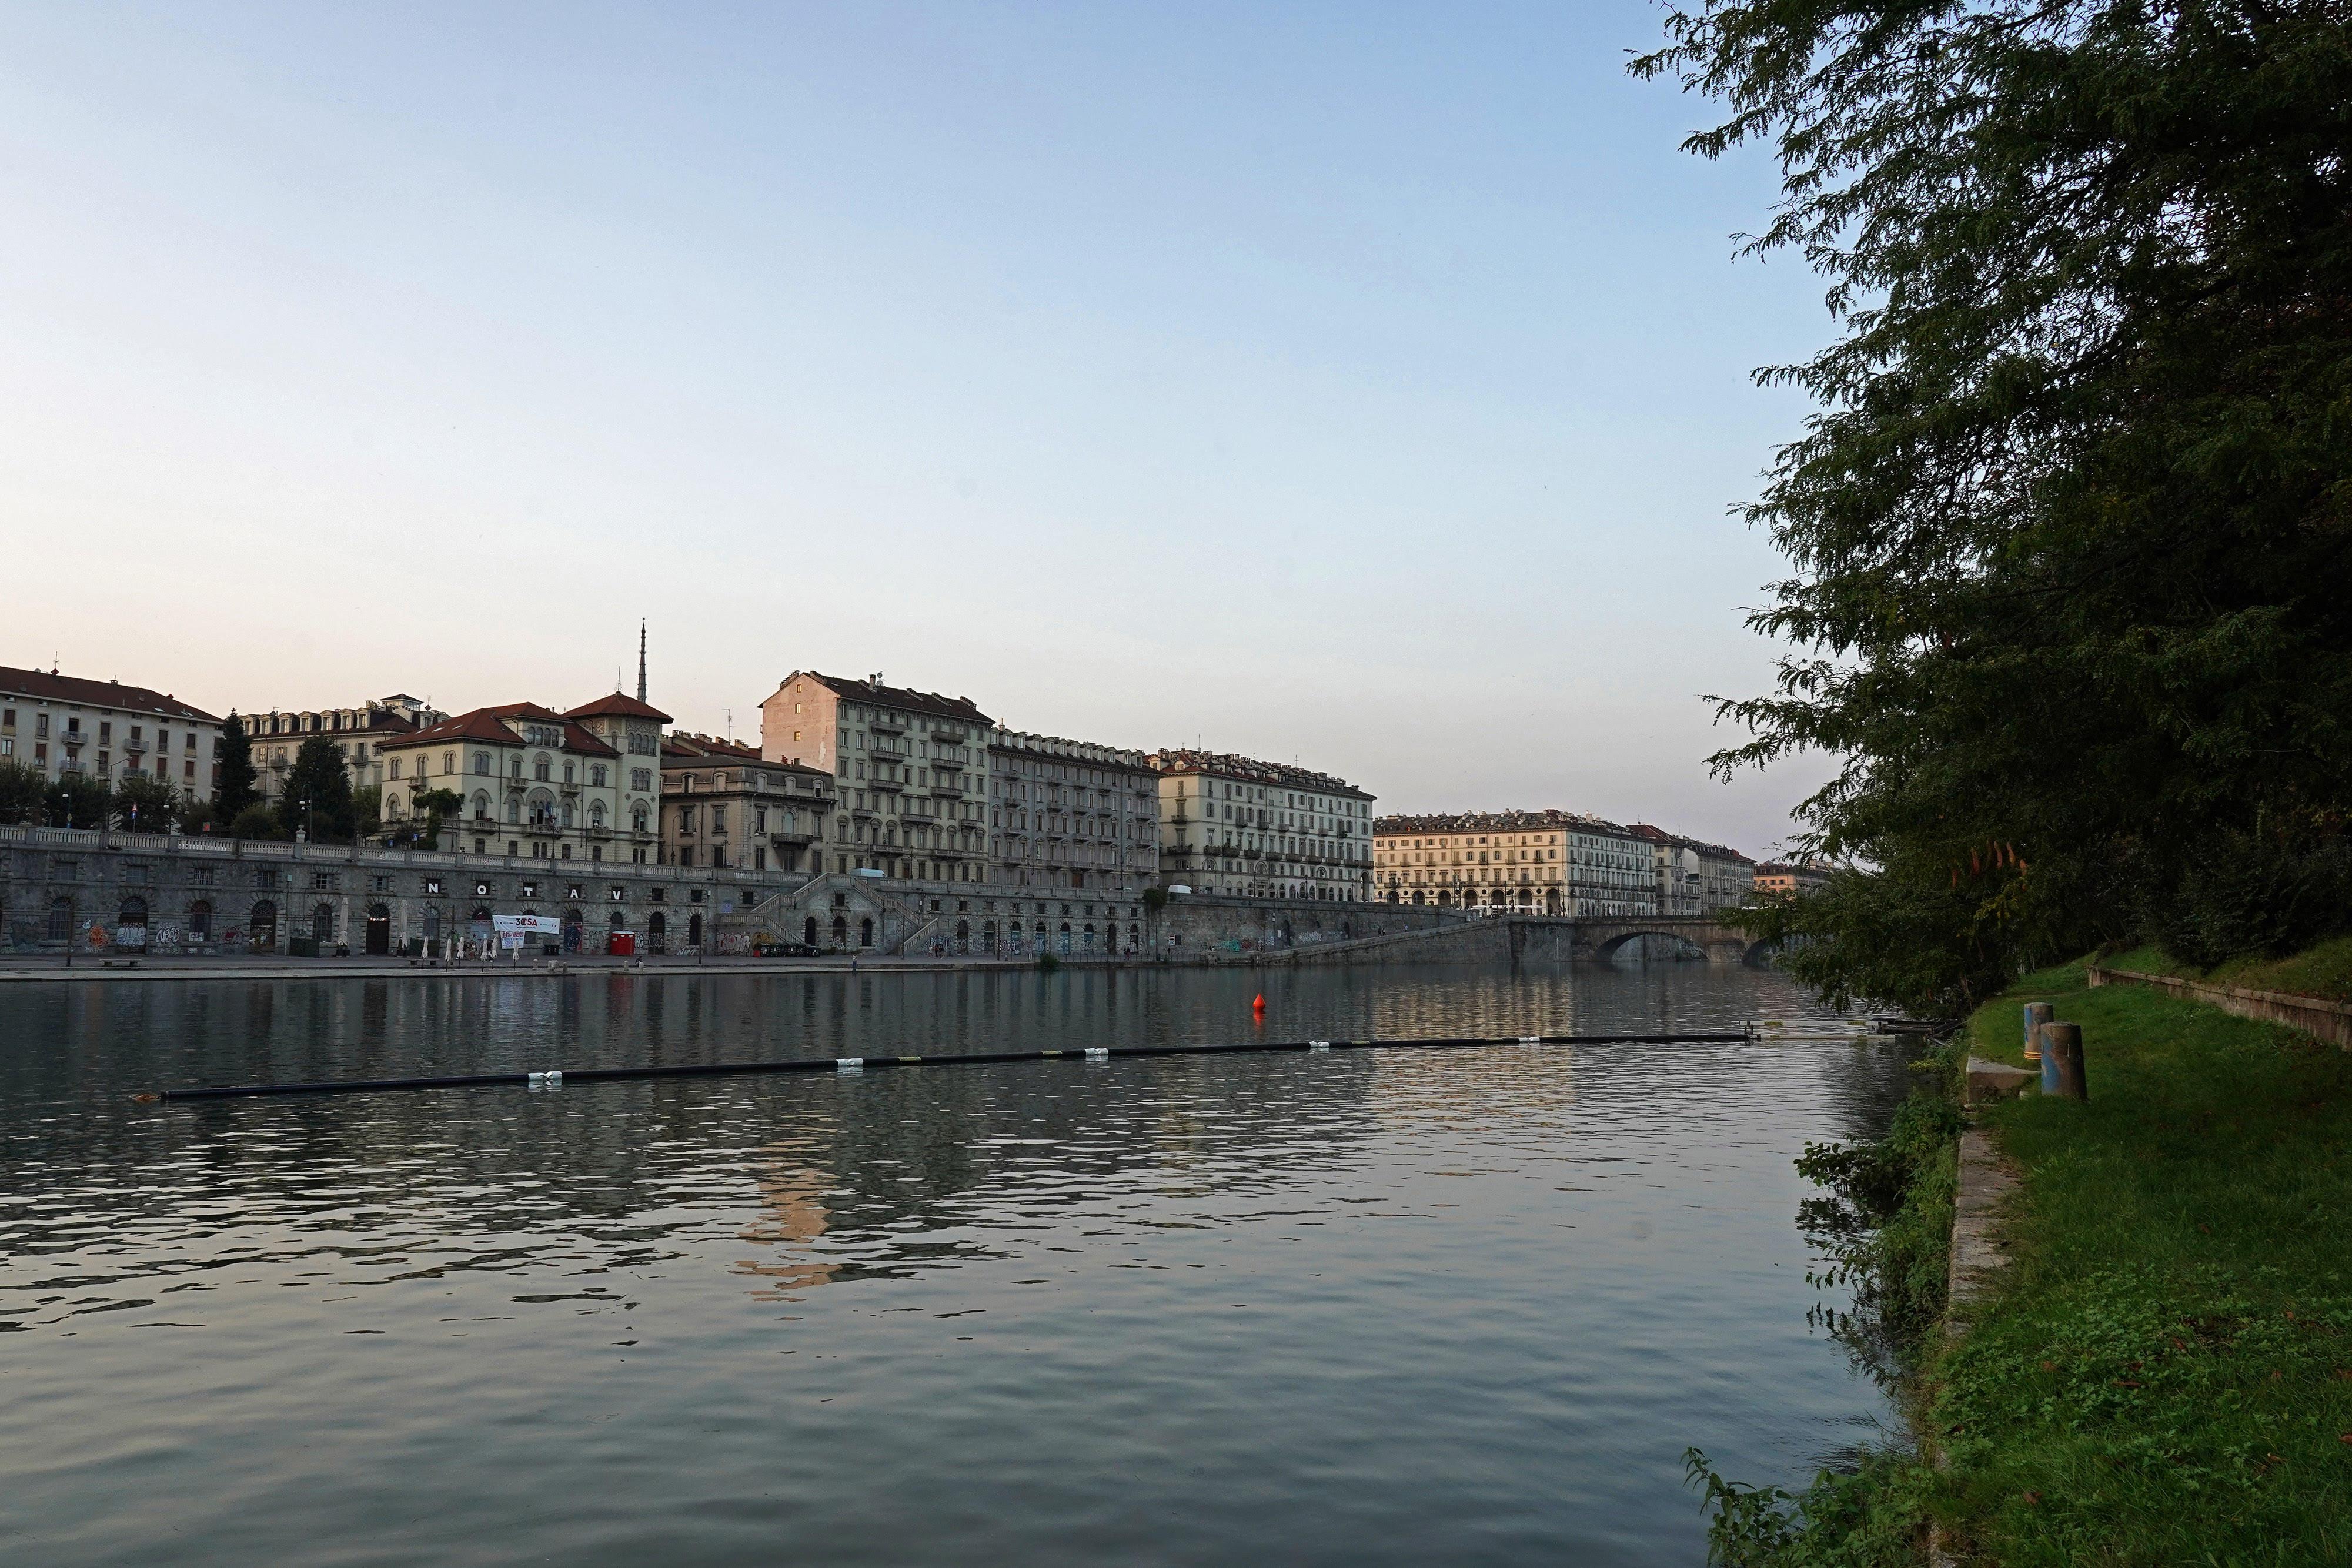 barriere-galleggianti-murazzi-torino.jpg